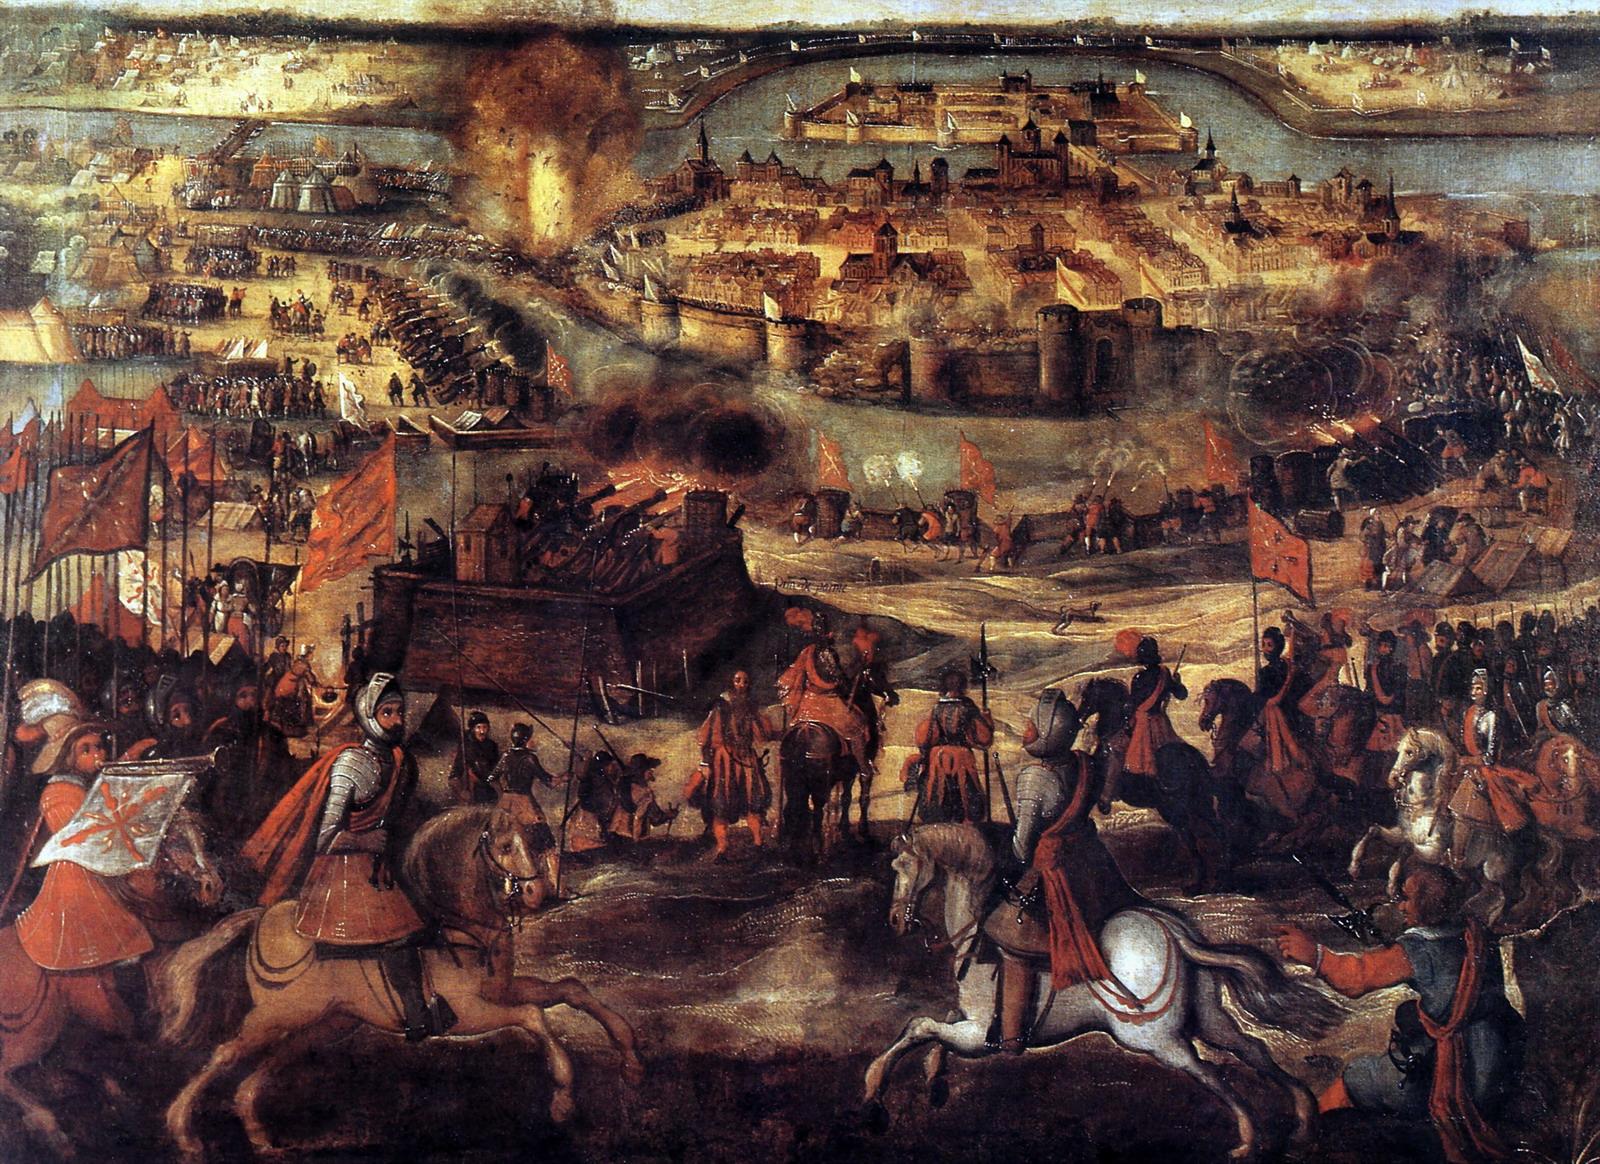 File:1579 Siege of Maastricht - Aranjuez Palace.jpg